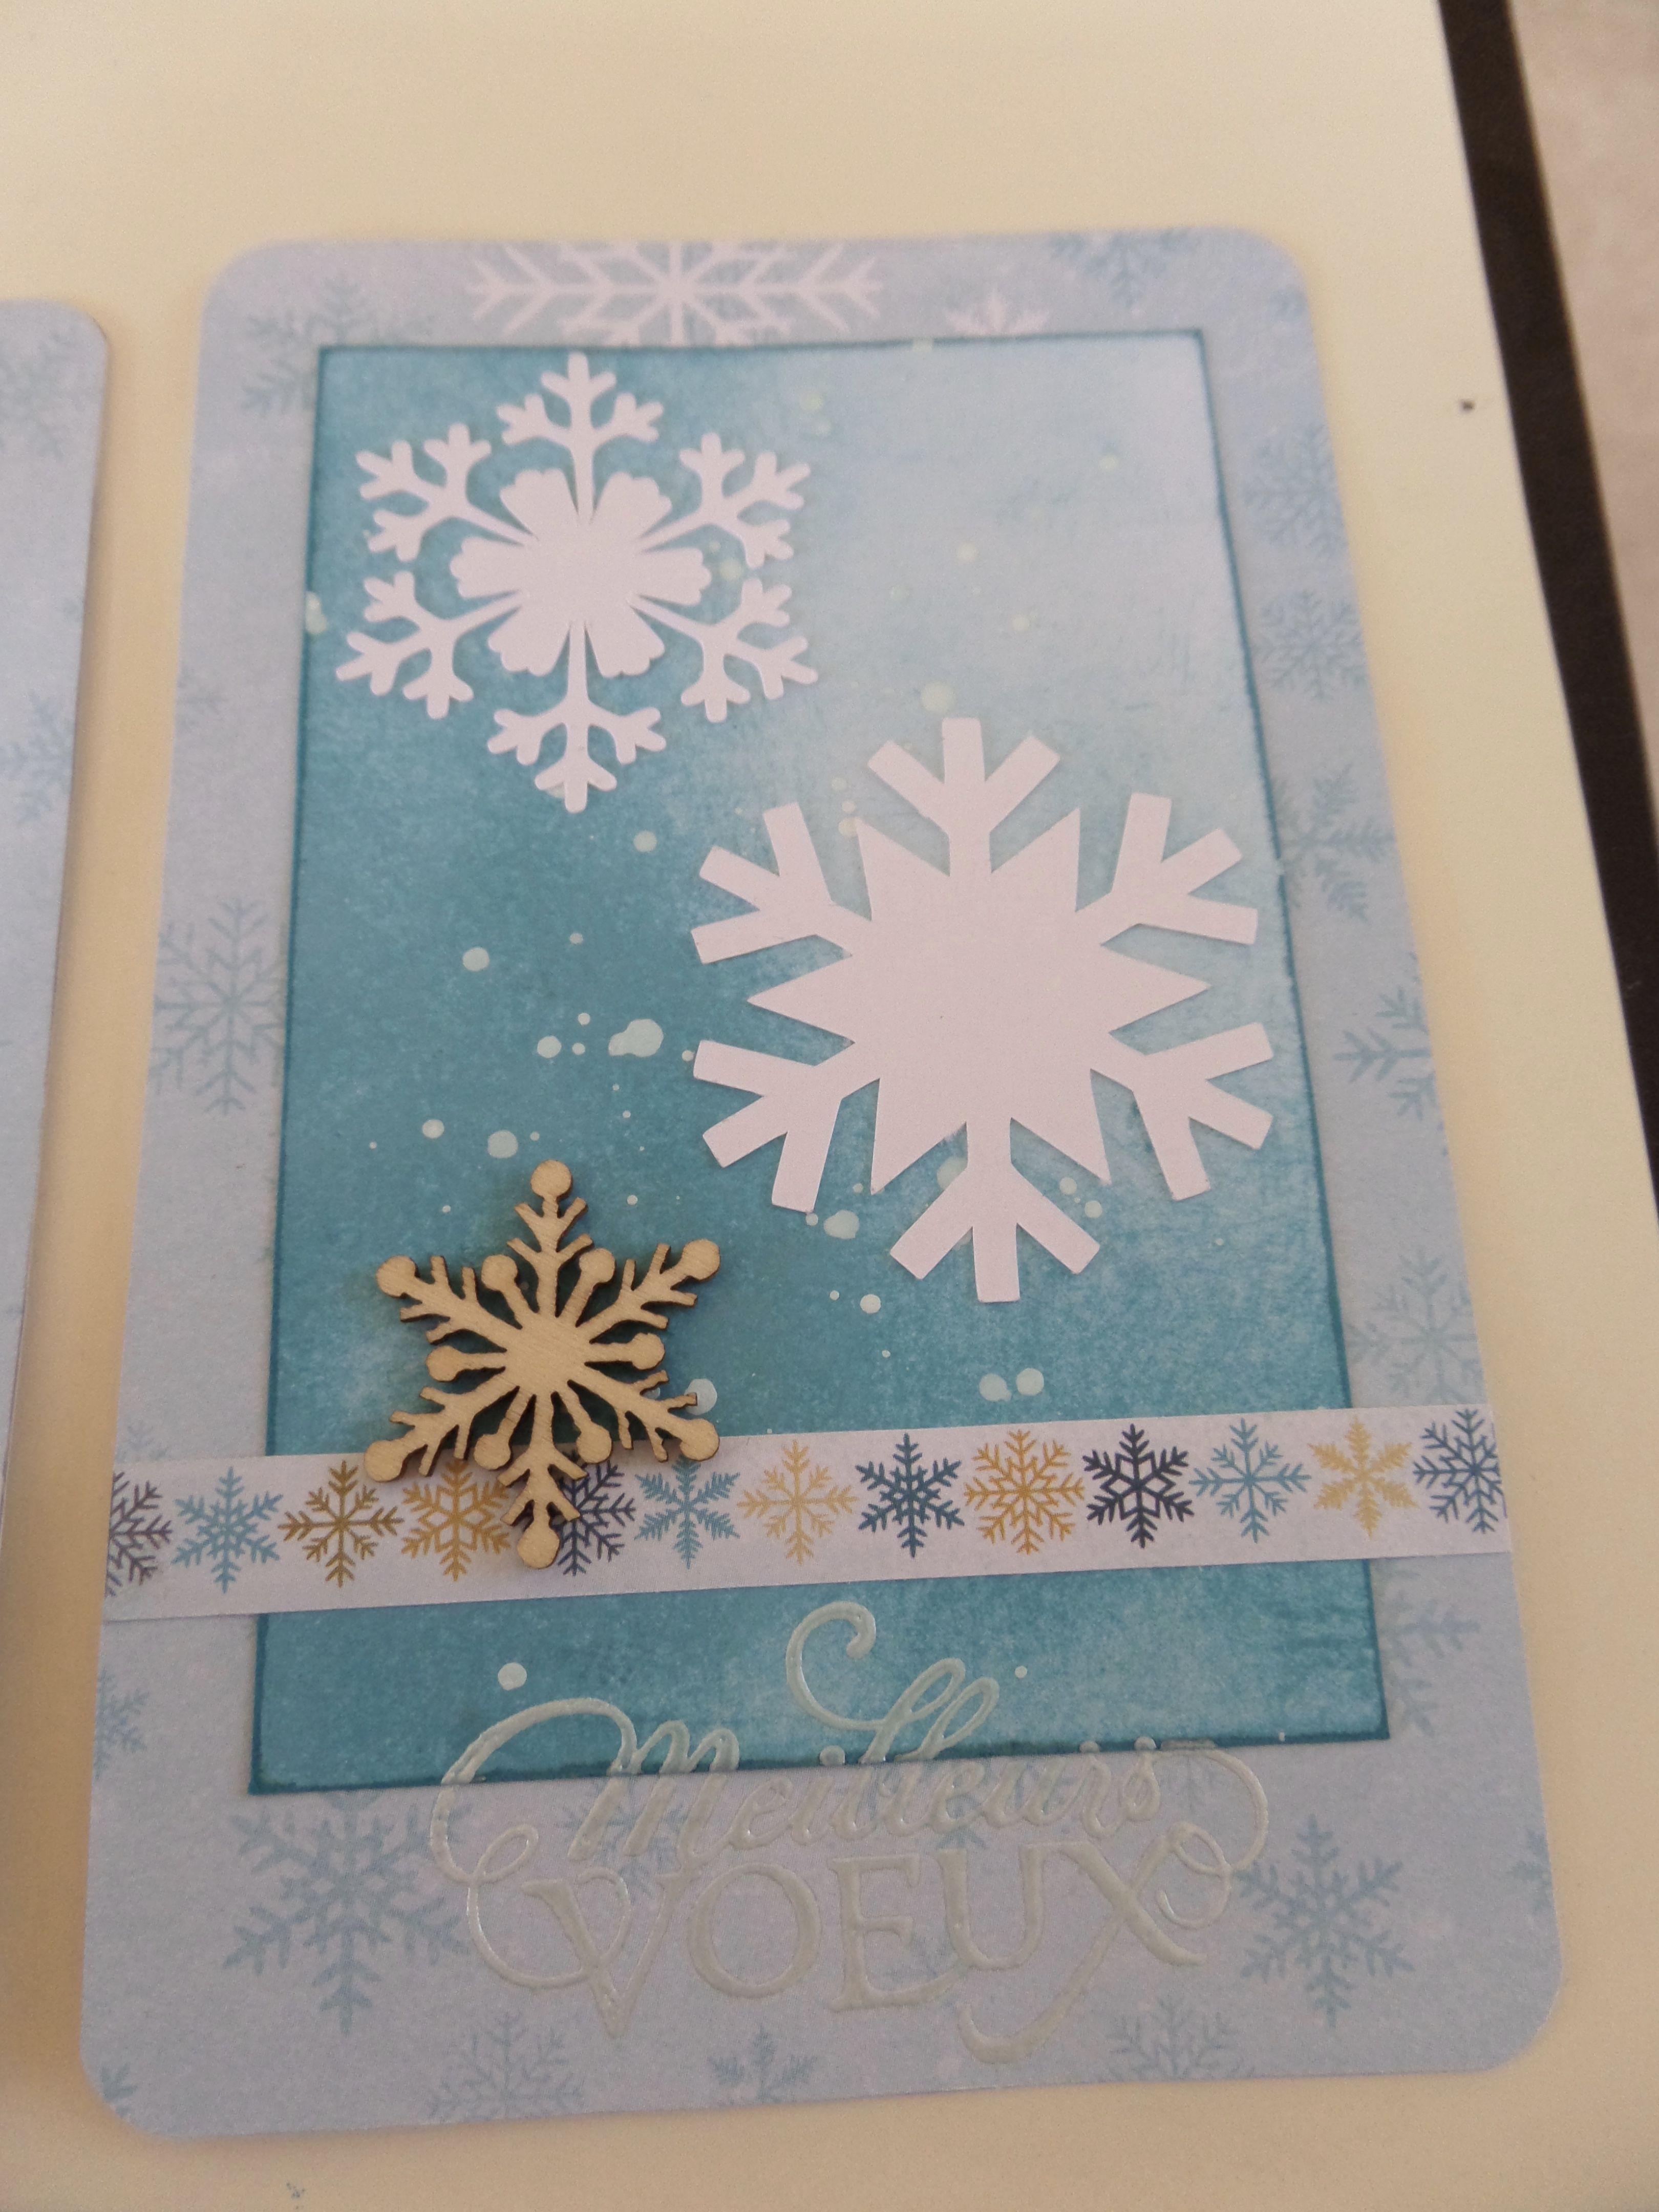 Carte de vœux #christmas #noel #boule #magic #believe #blue #star